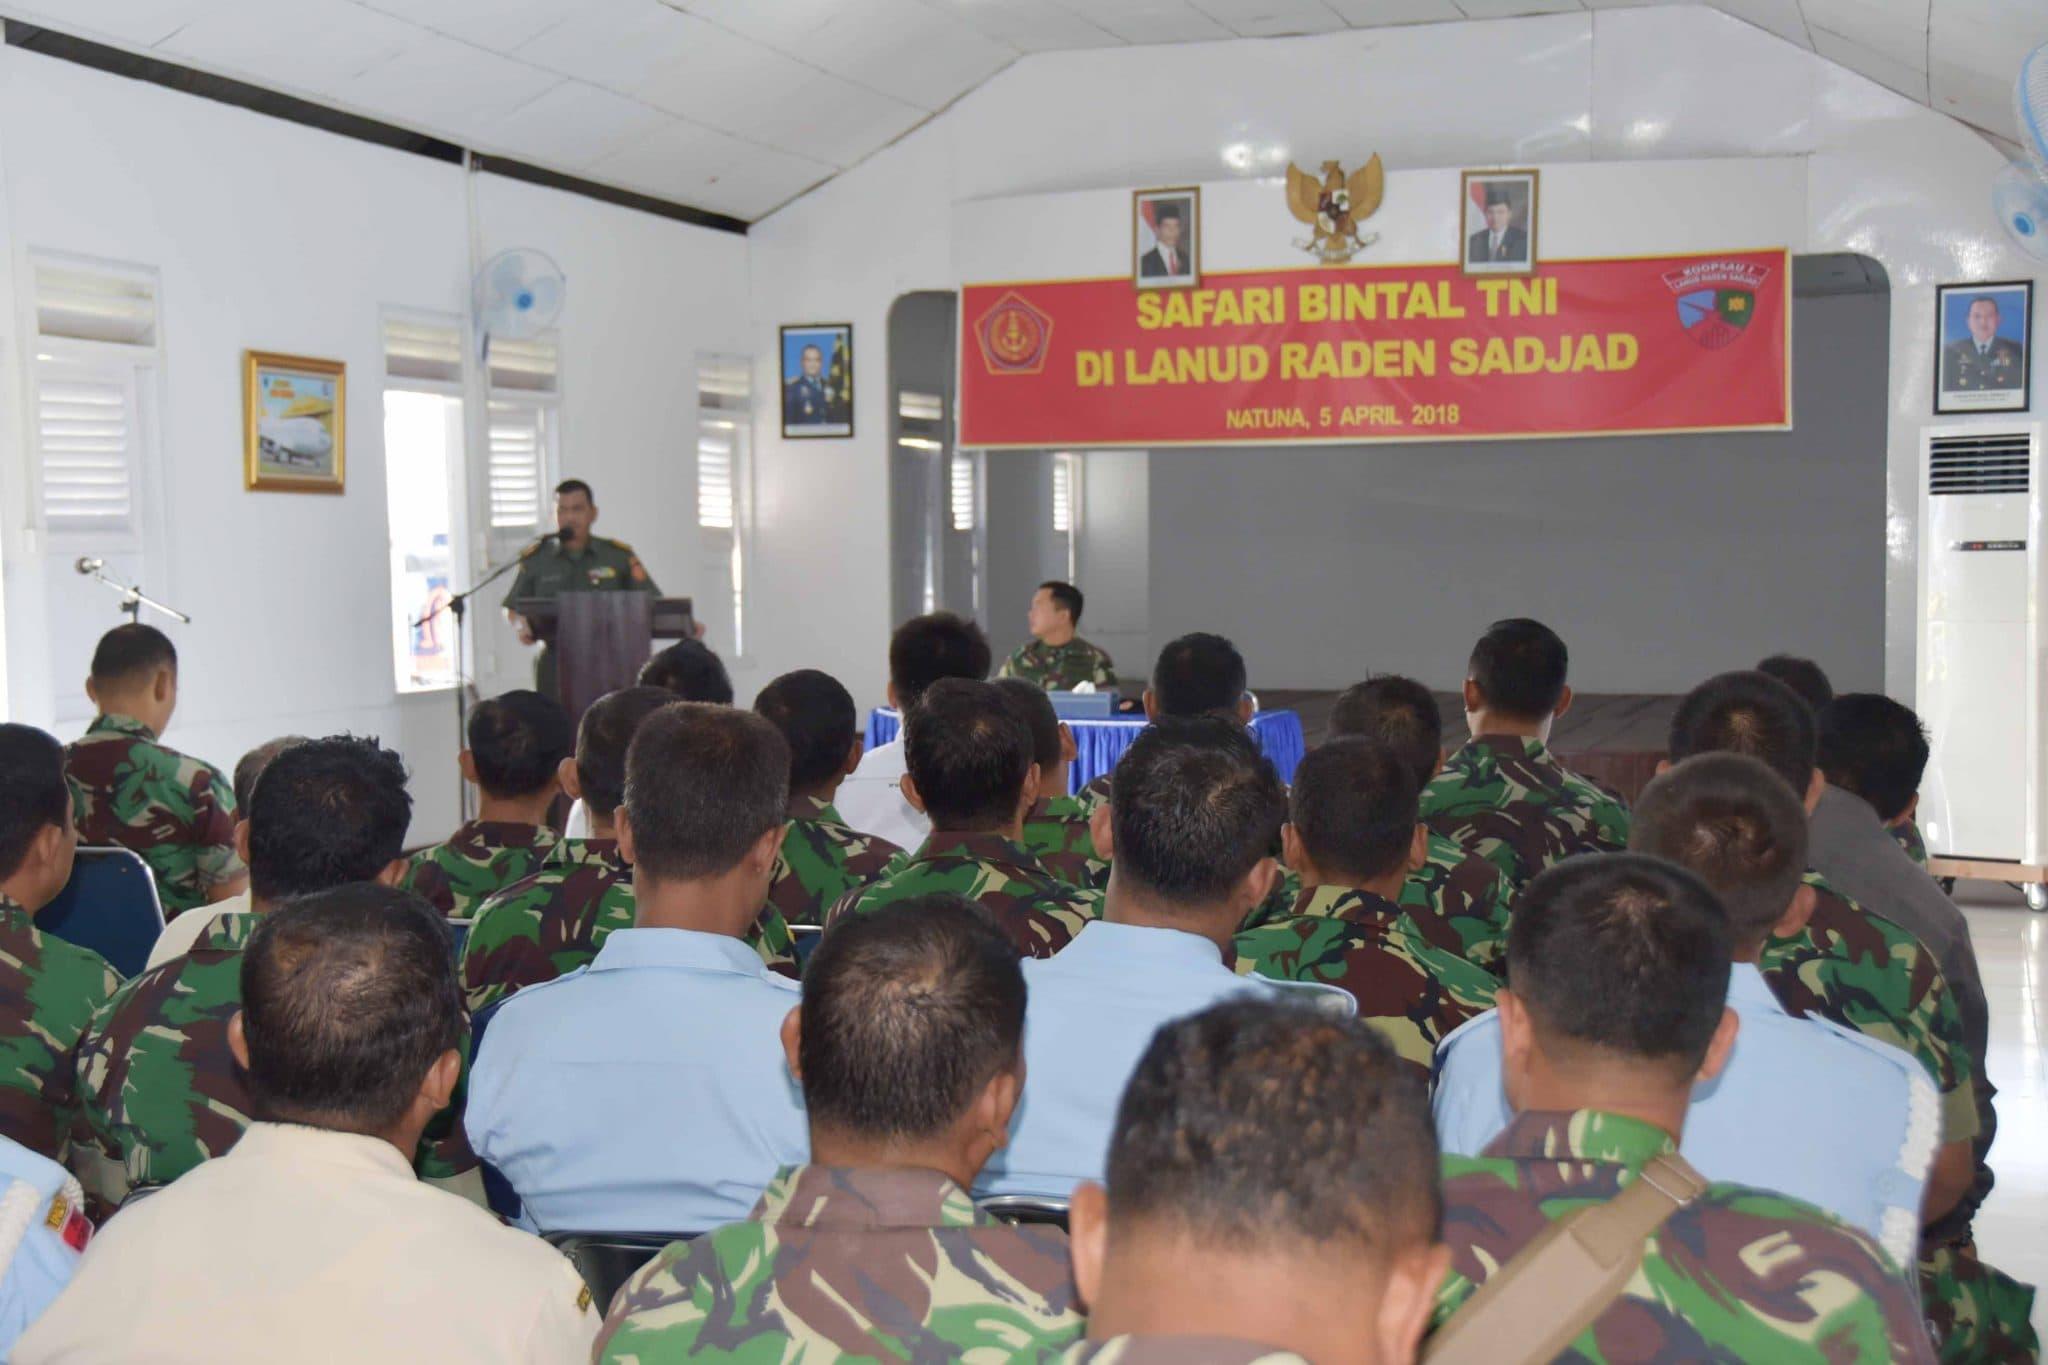 SAFARI BINTAL TNI DI LANUD RADEN SADJAD